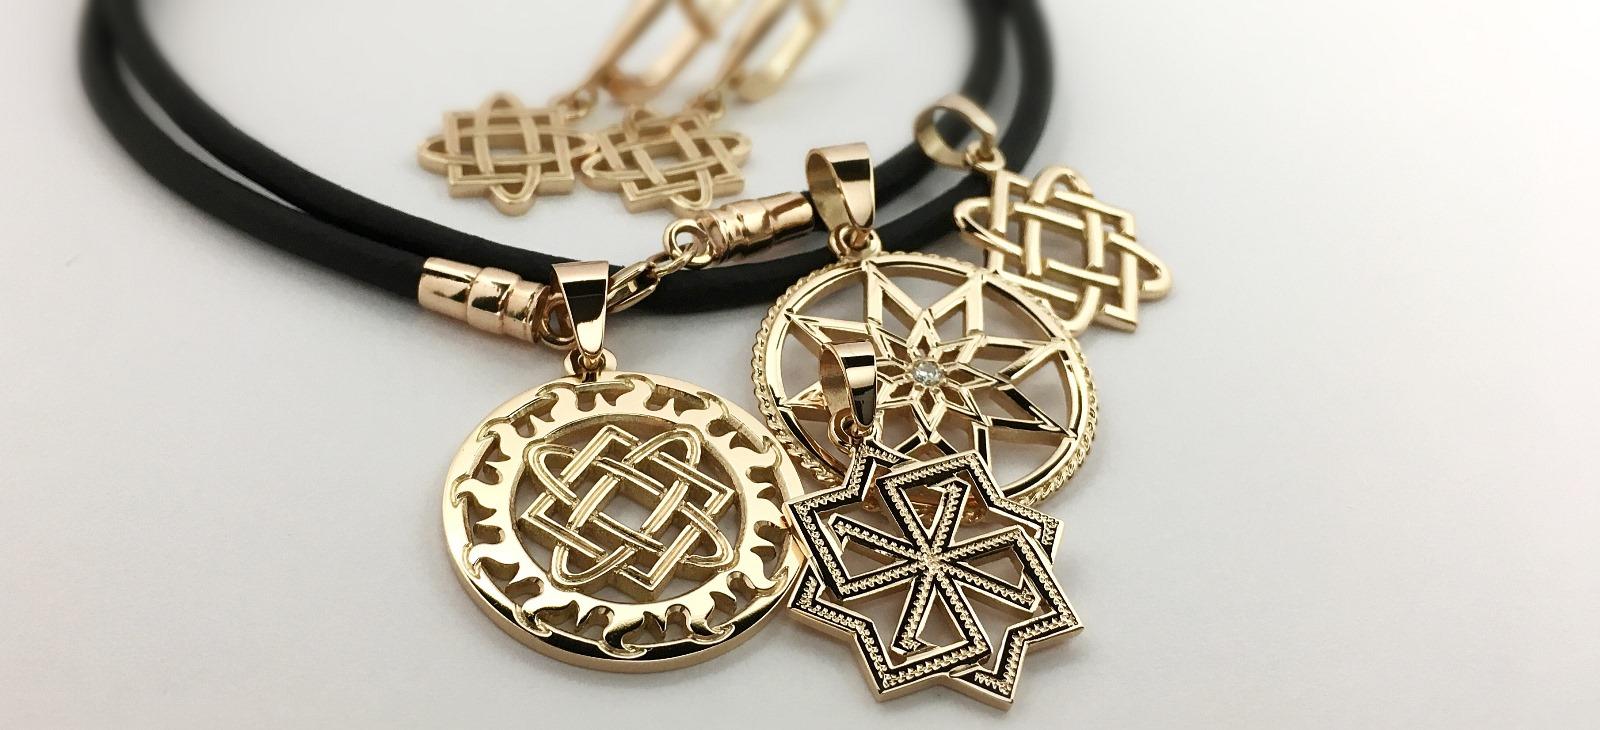 Славянские обереги из серебра и золота